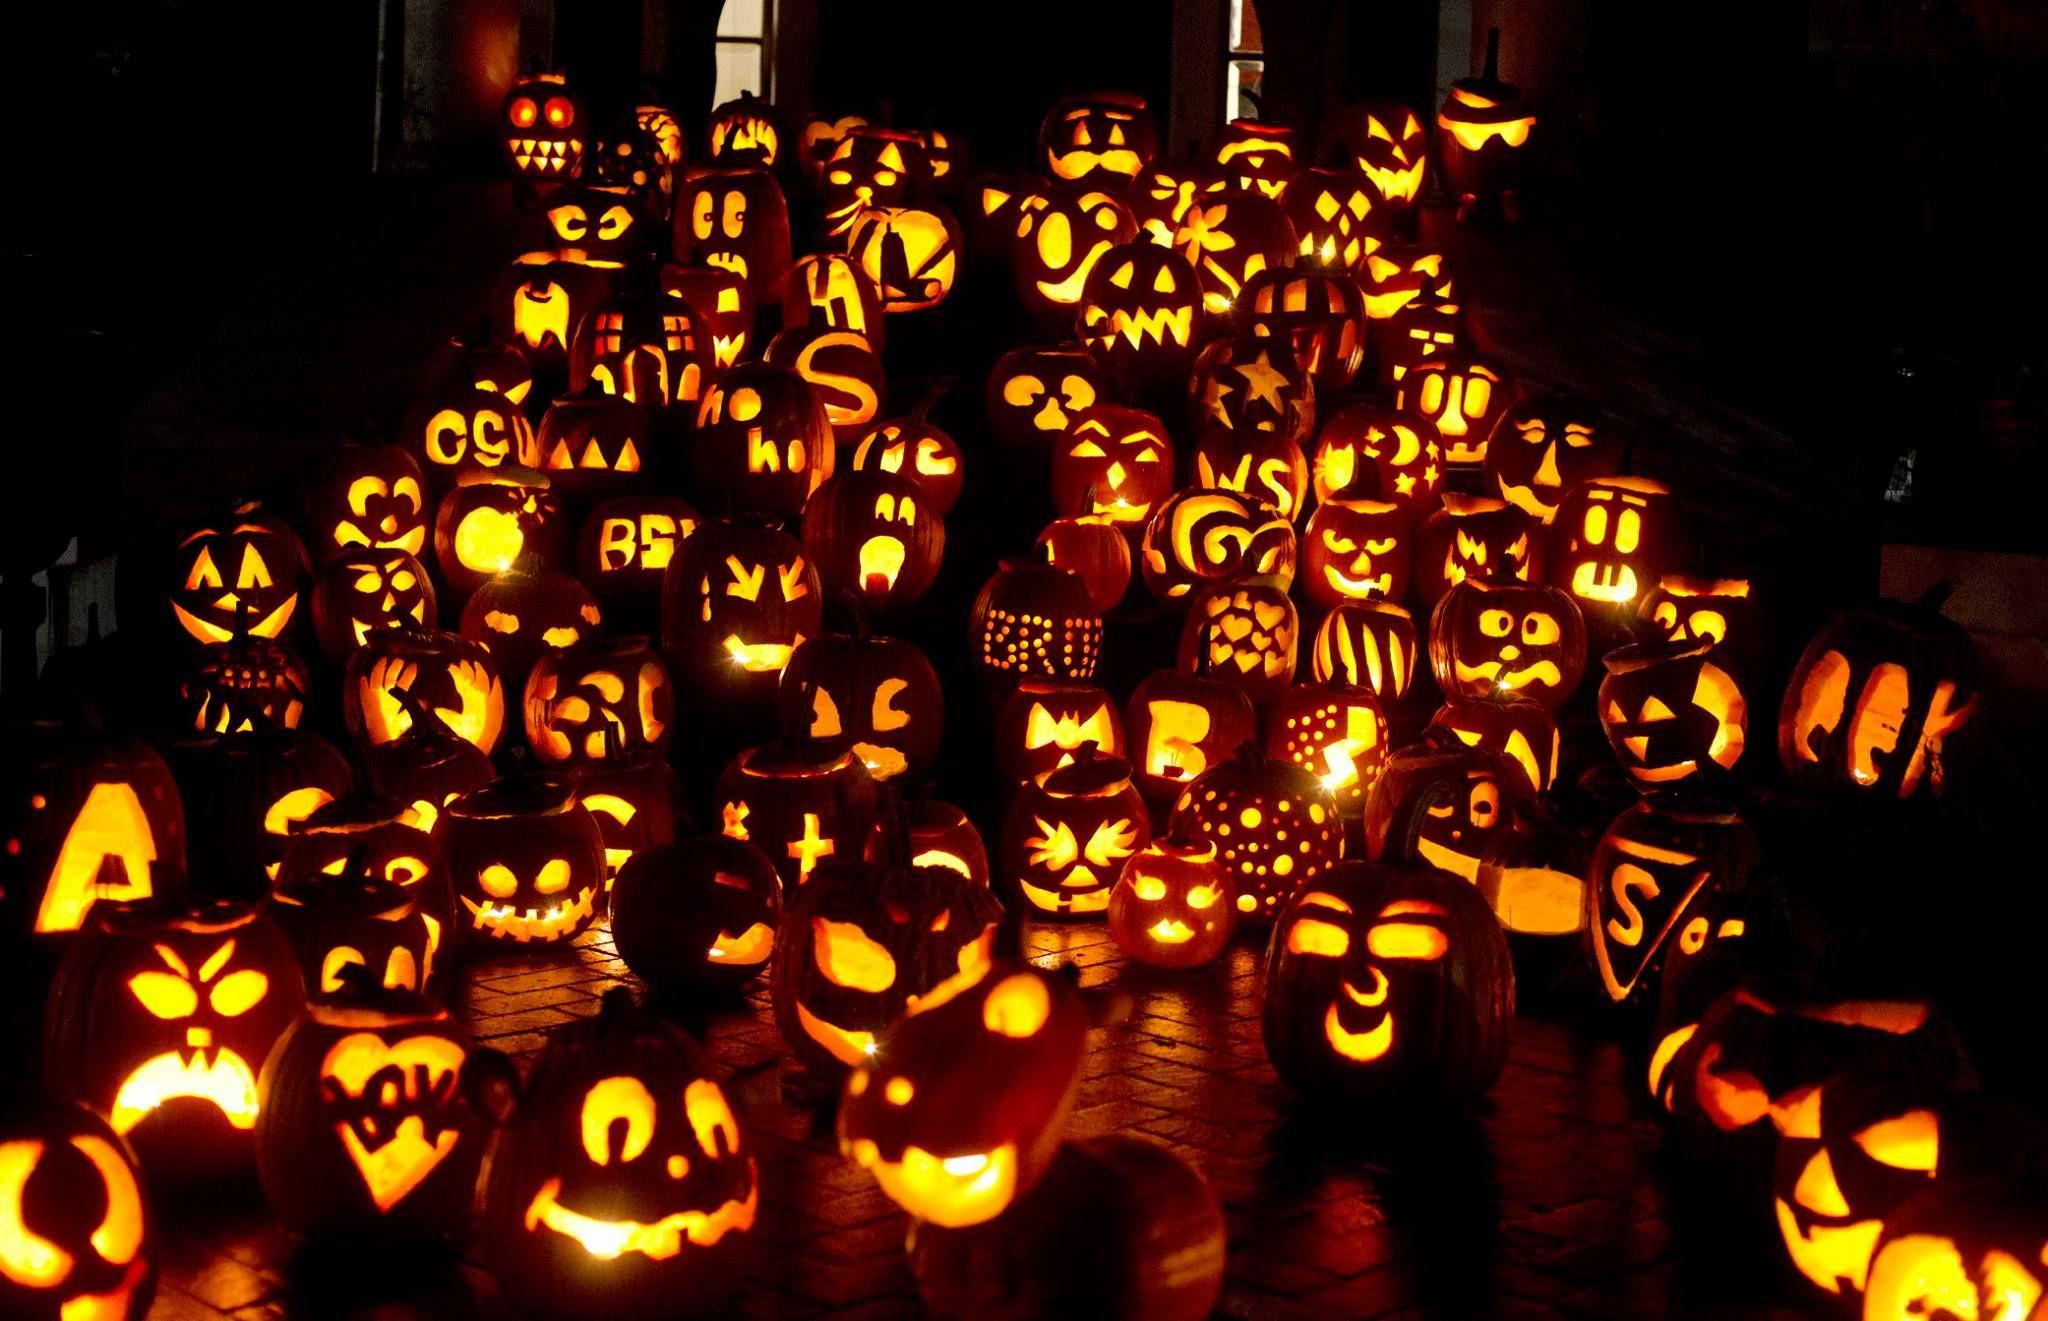 2020 Harrison Blvd Halloween Boise Idaho The Harrison Blvd. Pumpkin House all lit up! Happy Halloween